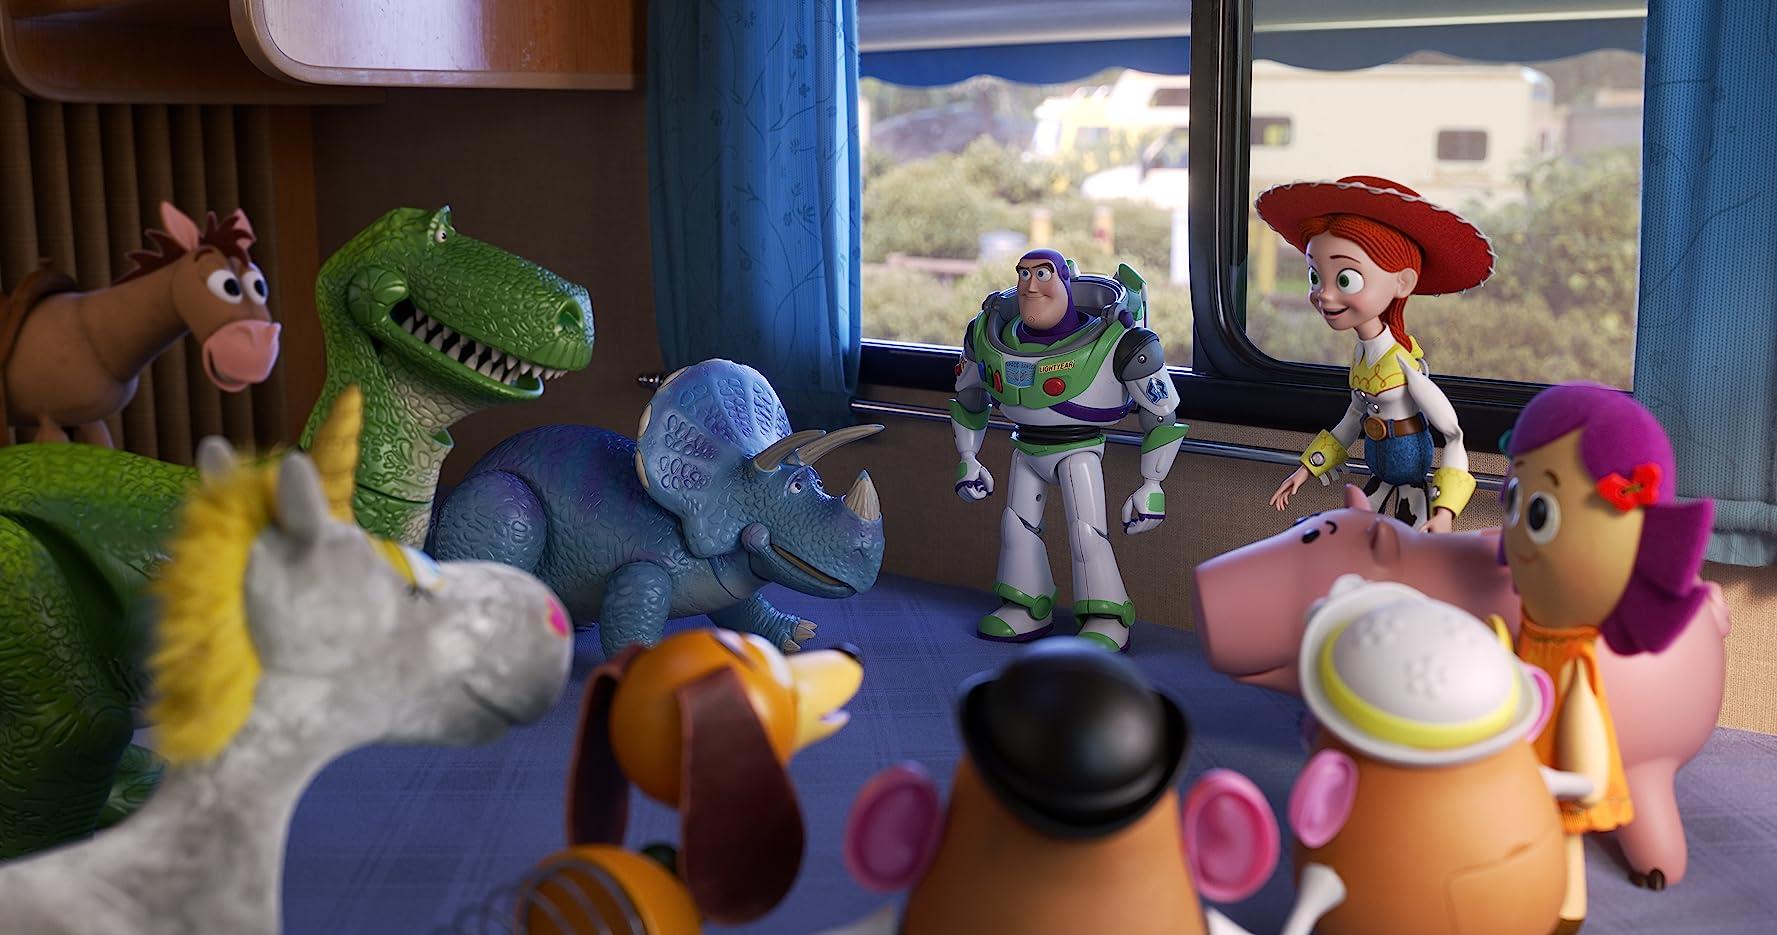 Joan Cusack, Tim Allen, Bonnie Hunt, John Ratzenberger, Wallace Shawn, Blake Clark, Jeff Garlin, and Kristen Schaal in Toy Story 4 (2019)